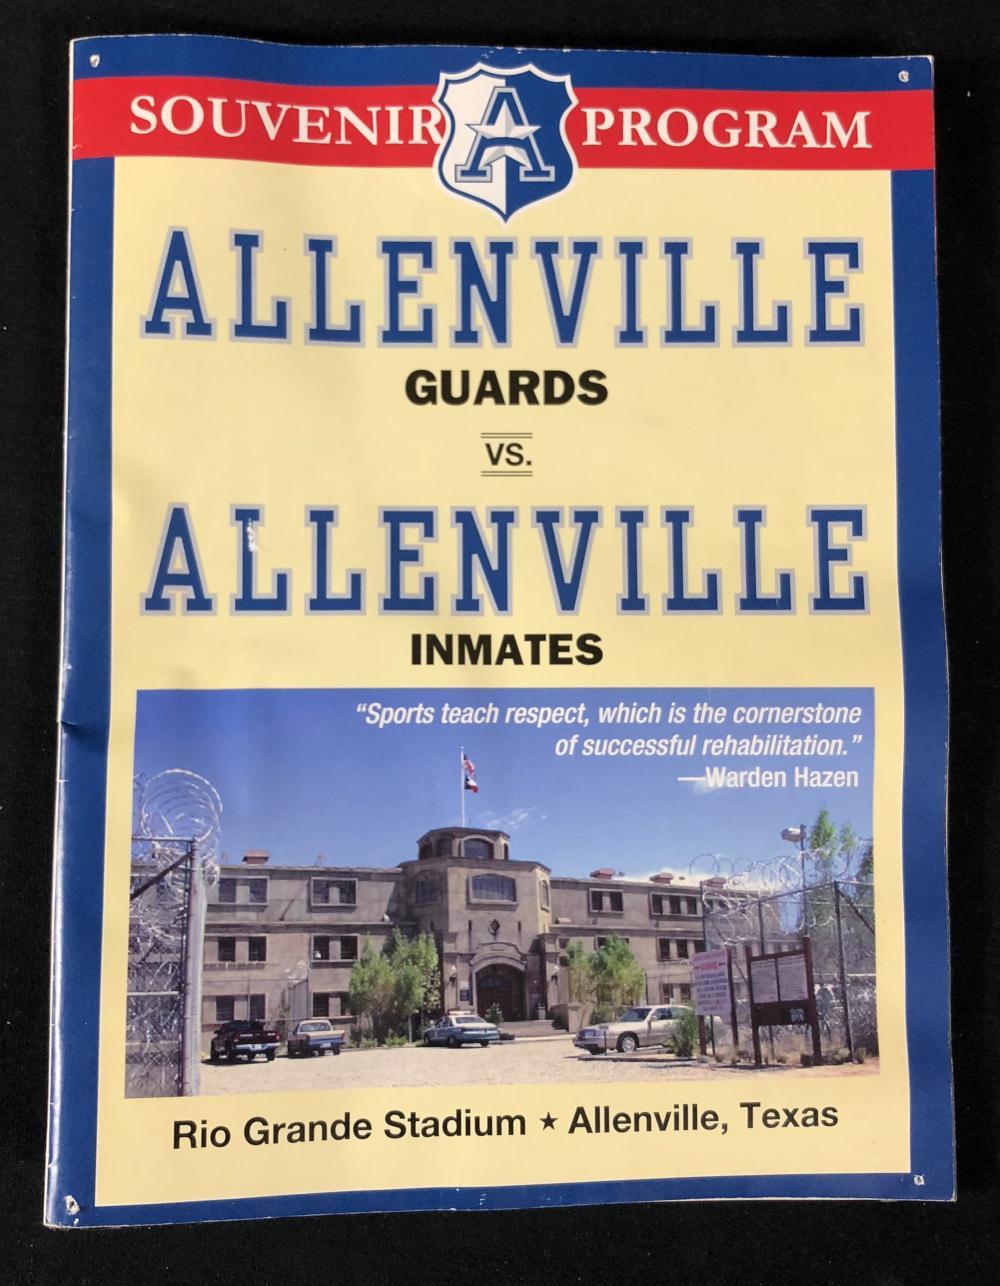 The Longest Yard (2005) - Souvenir Program From Prison Football Game